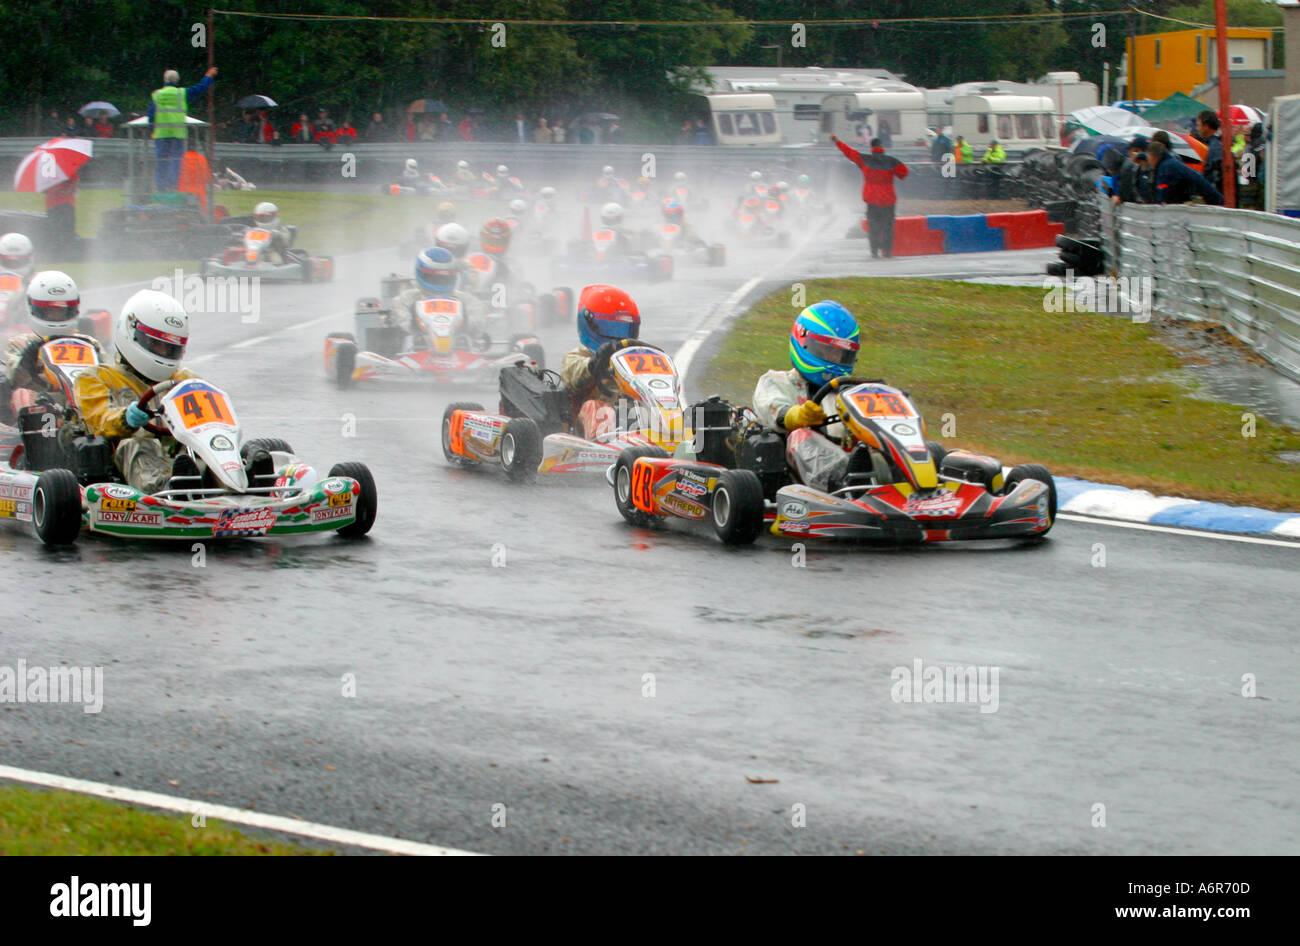 Mini Max Go Kart racing on wet race track Stock Photo: 2160396 - Alamy